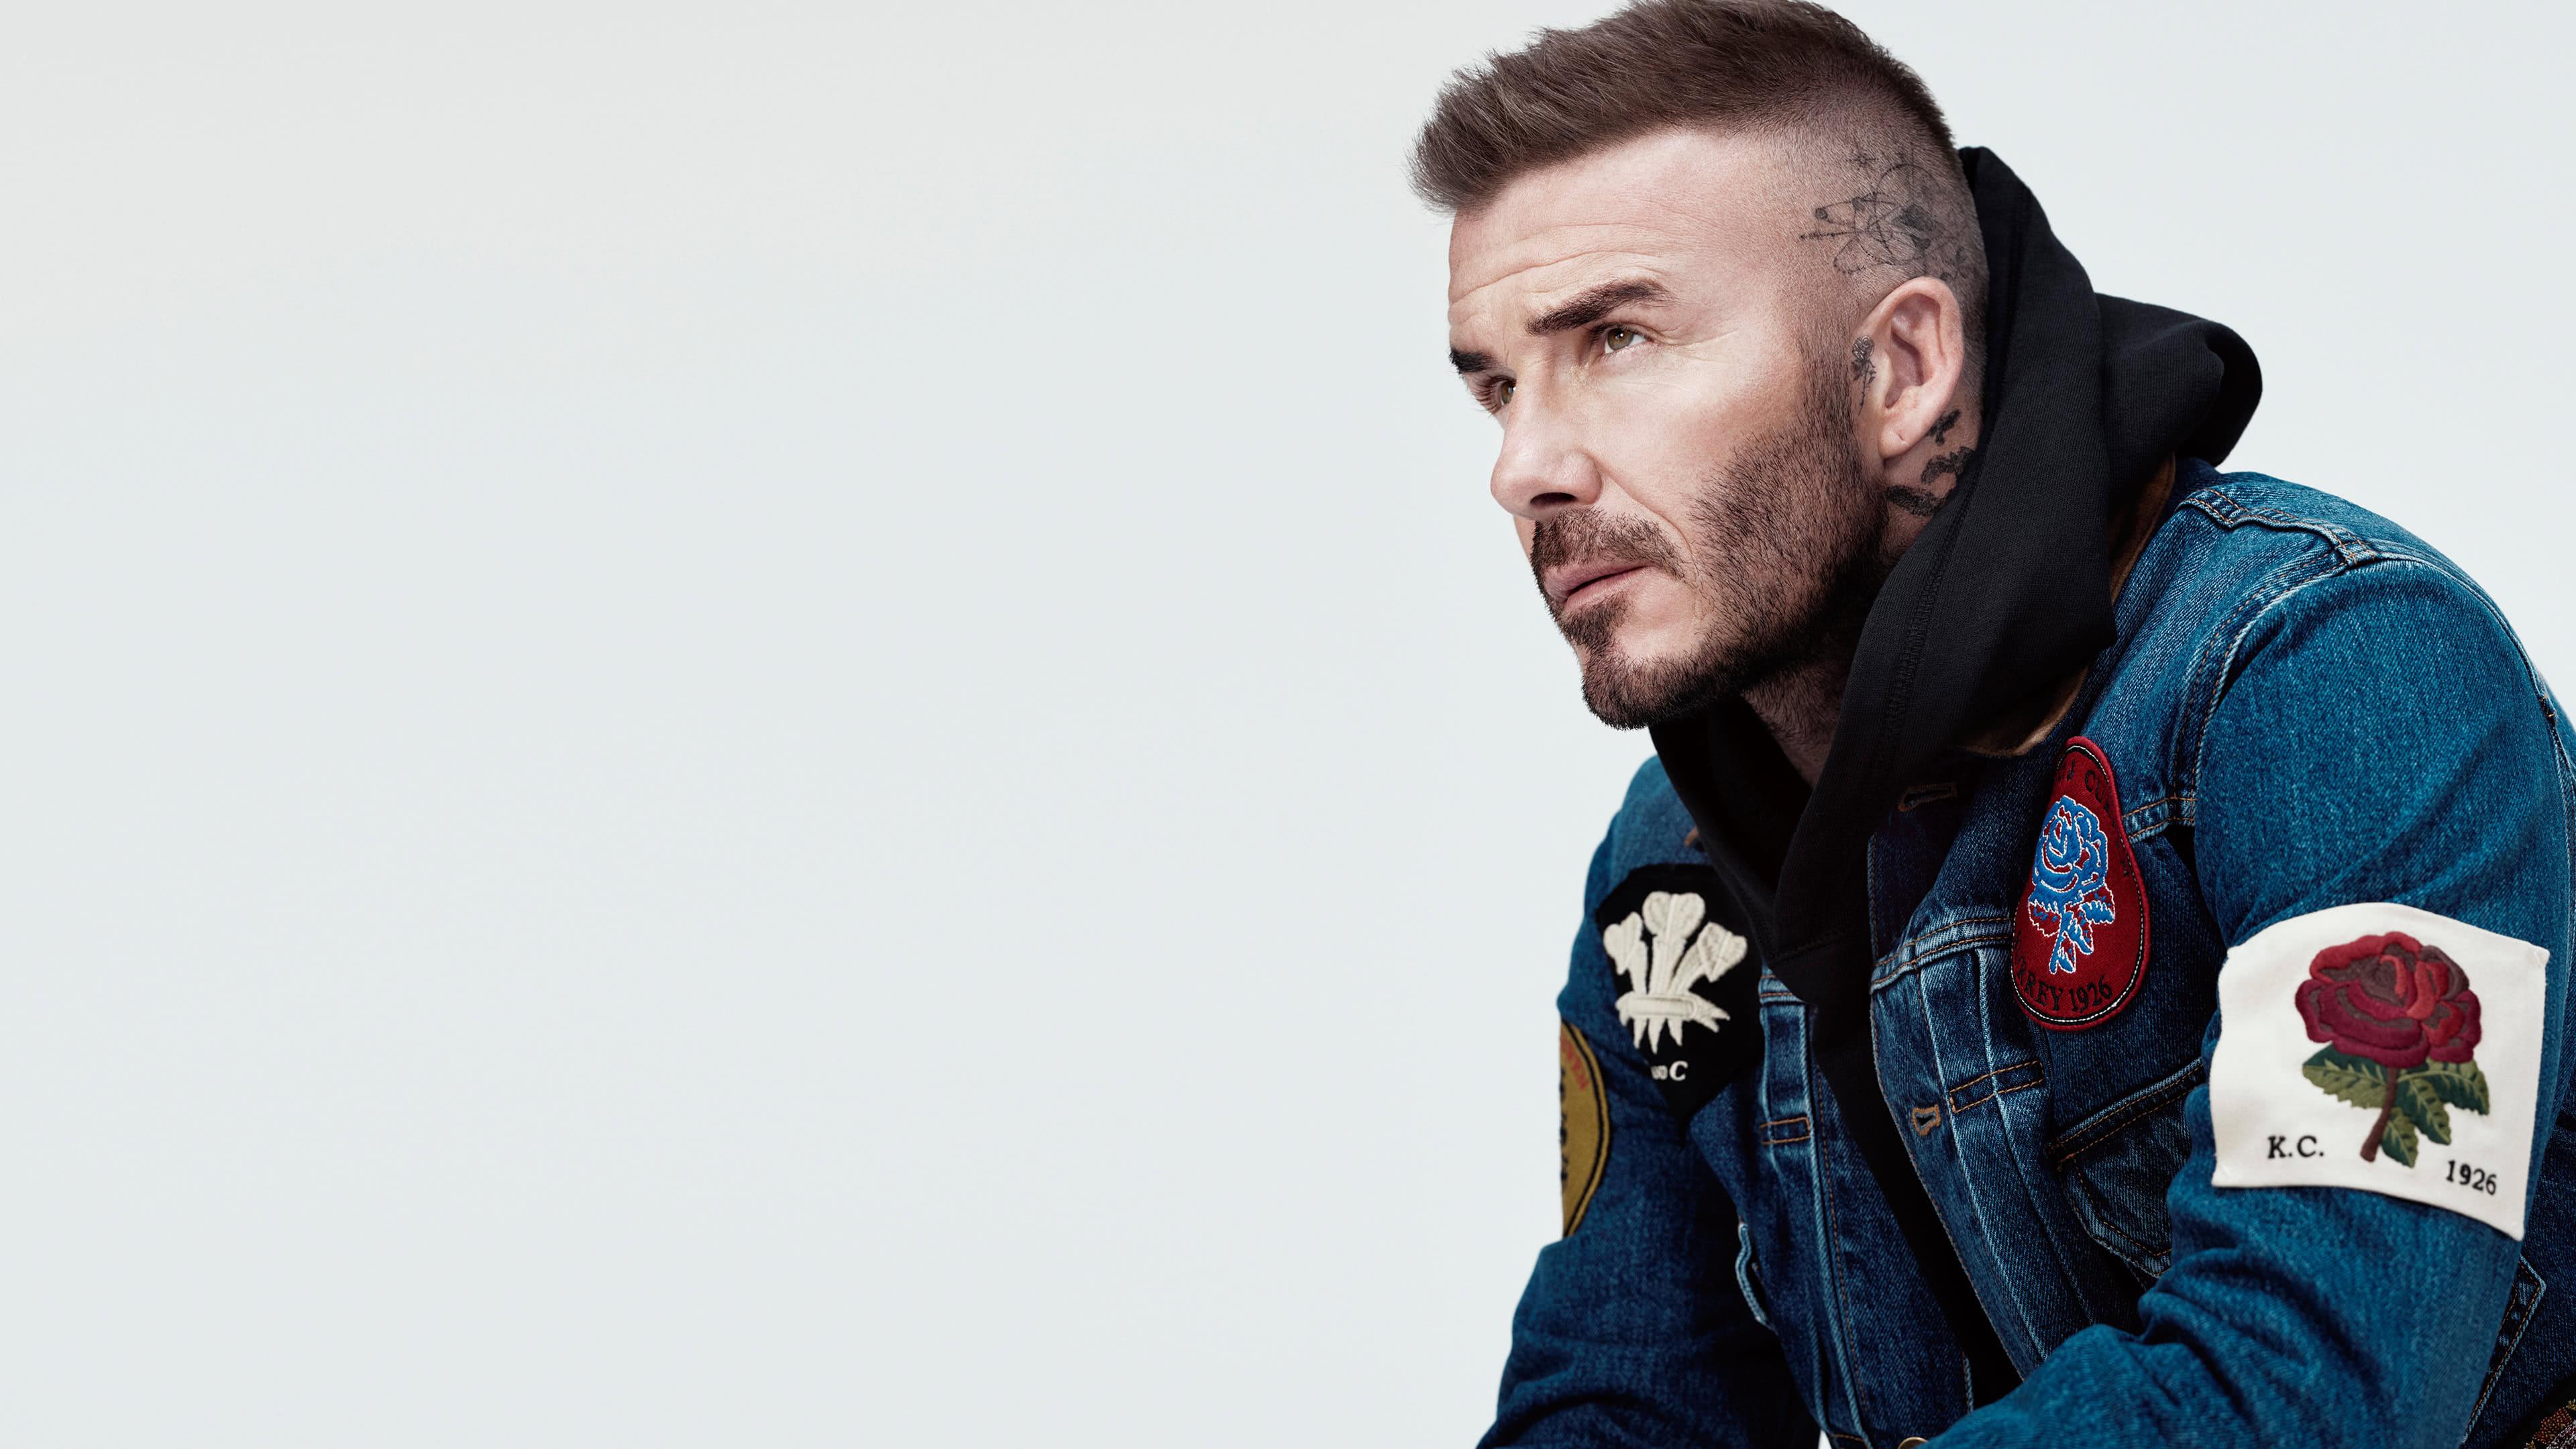 David Beckham Photoshoot Uhd 4k Wallpaper Pixelz